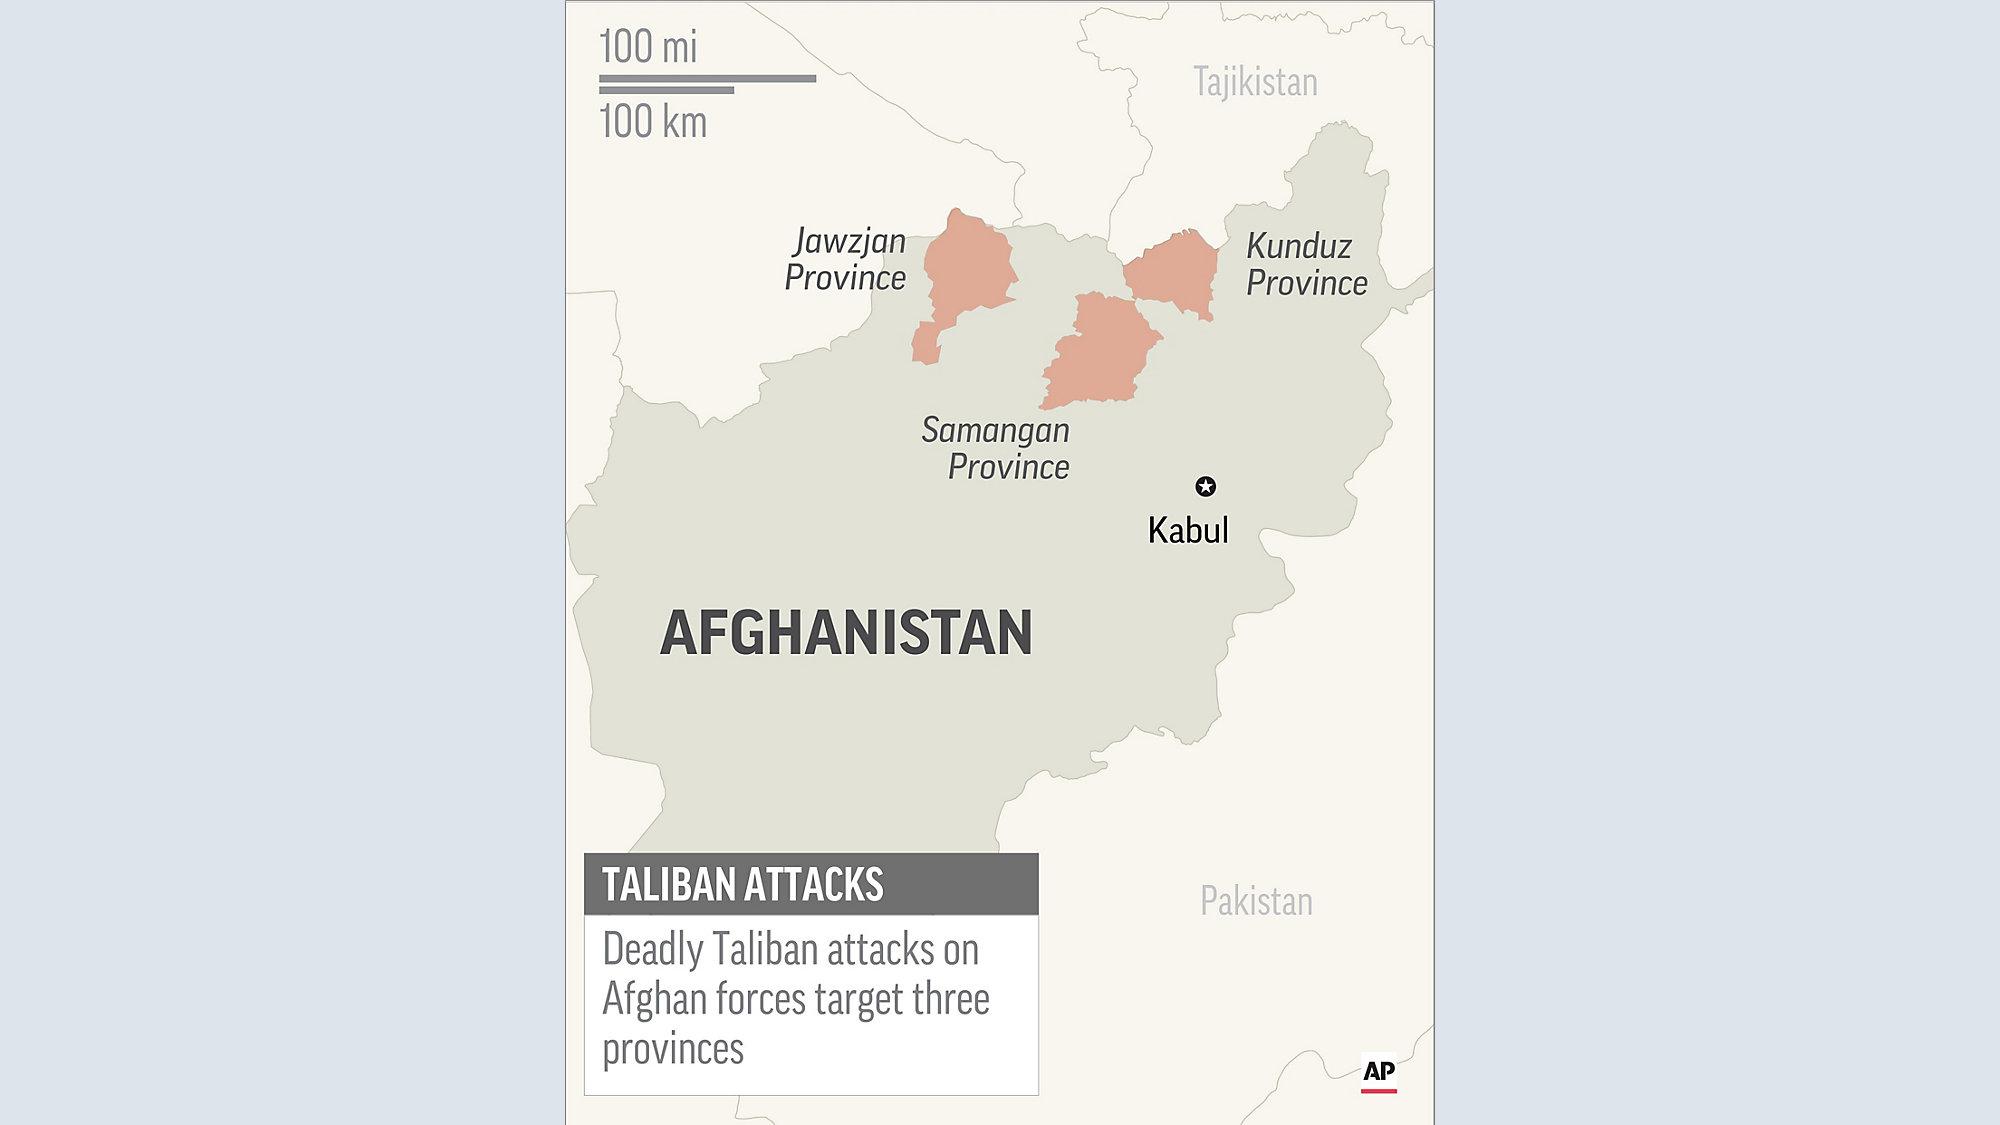 Officials: Taliban Afghan security forces, killing 21 on panjshir province, ghazni province, baghlan province, takhar province, nangarhar province afghanistan map, nuristan afghanistan map, kapisa province afghanistan map, kapisa province, afghanistan khyber pass map, paktika province, khost province, wakhan corridor afghanistan map, gandamak afghanistan map, puli khumri afghanistan map, kathmandu afghanistan map, kandahar afghanistan map, nangarhar province, kabul province, fallujah afghanistan map, helmand afghanistan map, balkh province, istalif afghanistan map, laghman province, paktika province afghanistan map, afghanistan rivers map, panjshir province afghanistan map, gardez afghanistan map, badakhshan province, herat afghanistan map, helmand province, kandahar province, mazar-e sharif, herat province, islamabad afghanistan map, bala murghab afghanistan map, singesar afghanistan map, kunar province,